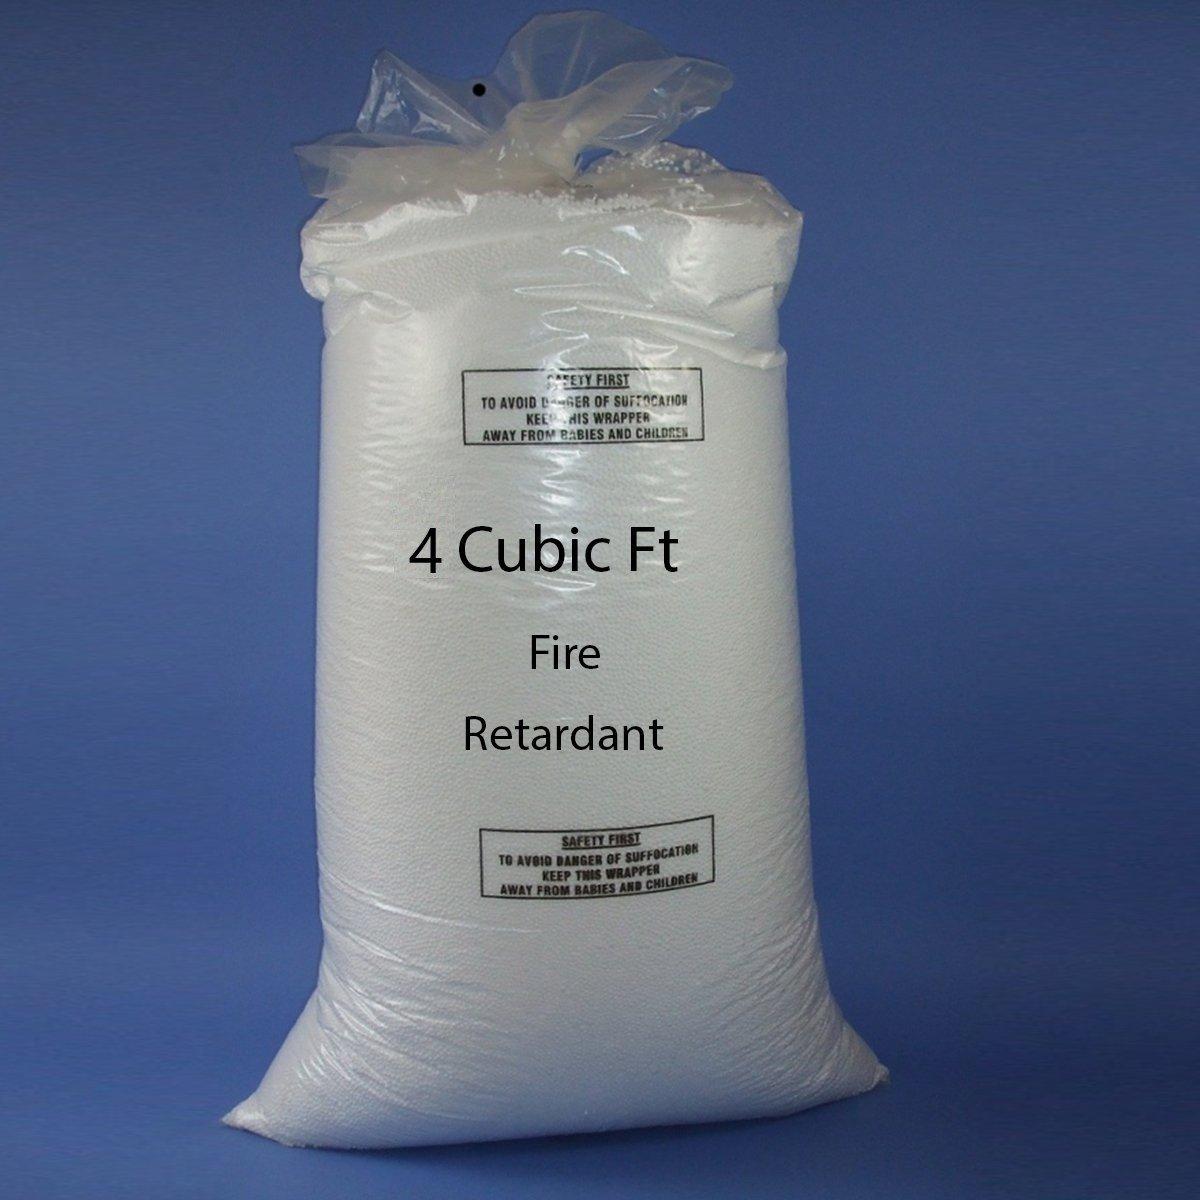 Bean Bag Booster Refill Polystyrene Beads Filling Top Up Bag Beans Balls 4 cubic feet Westminster